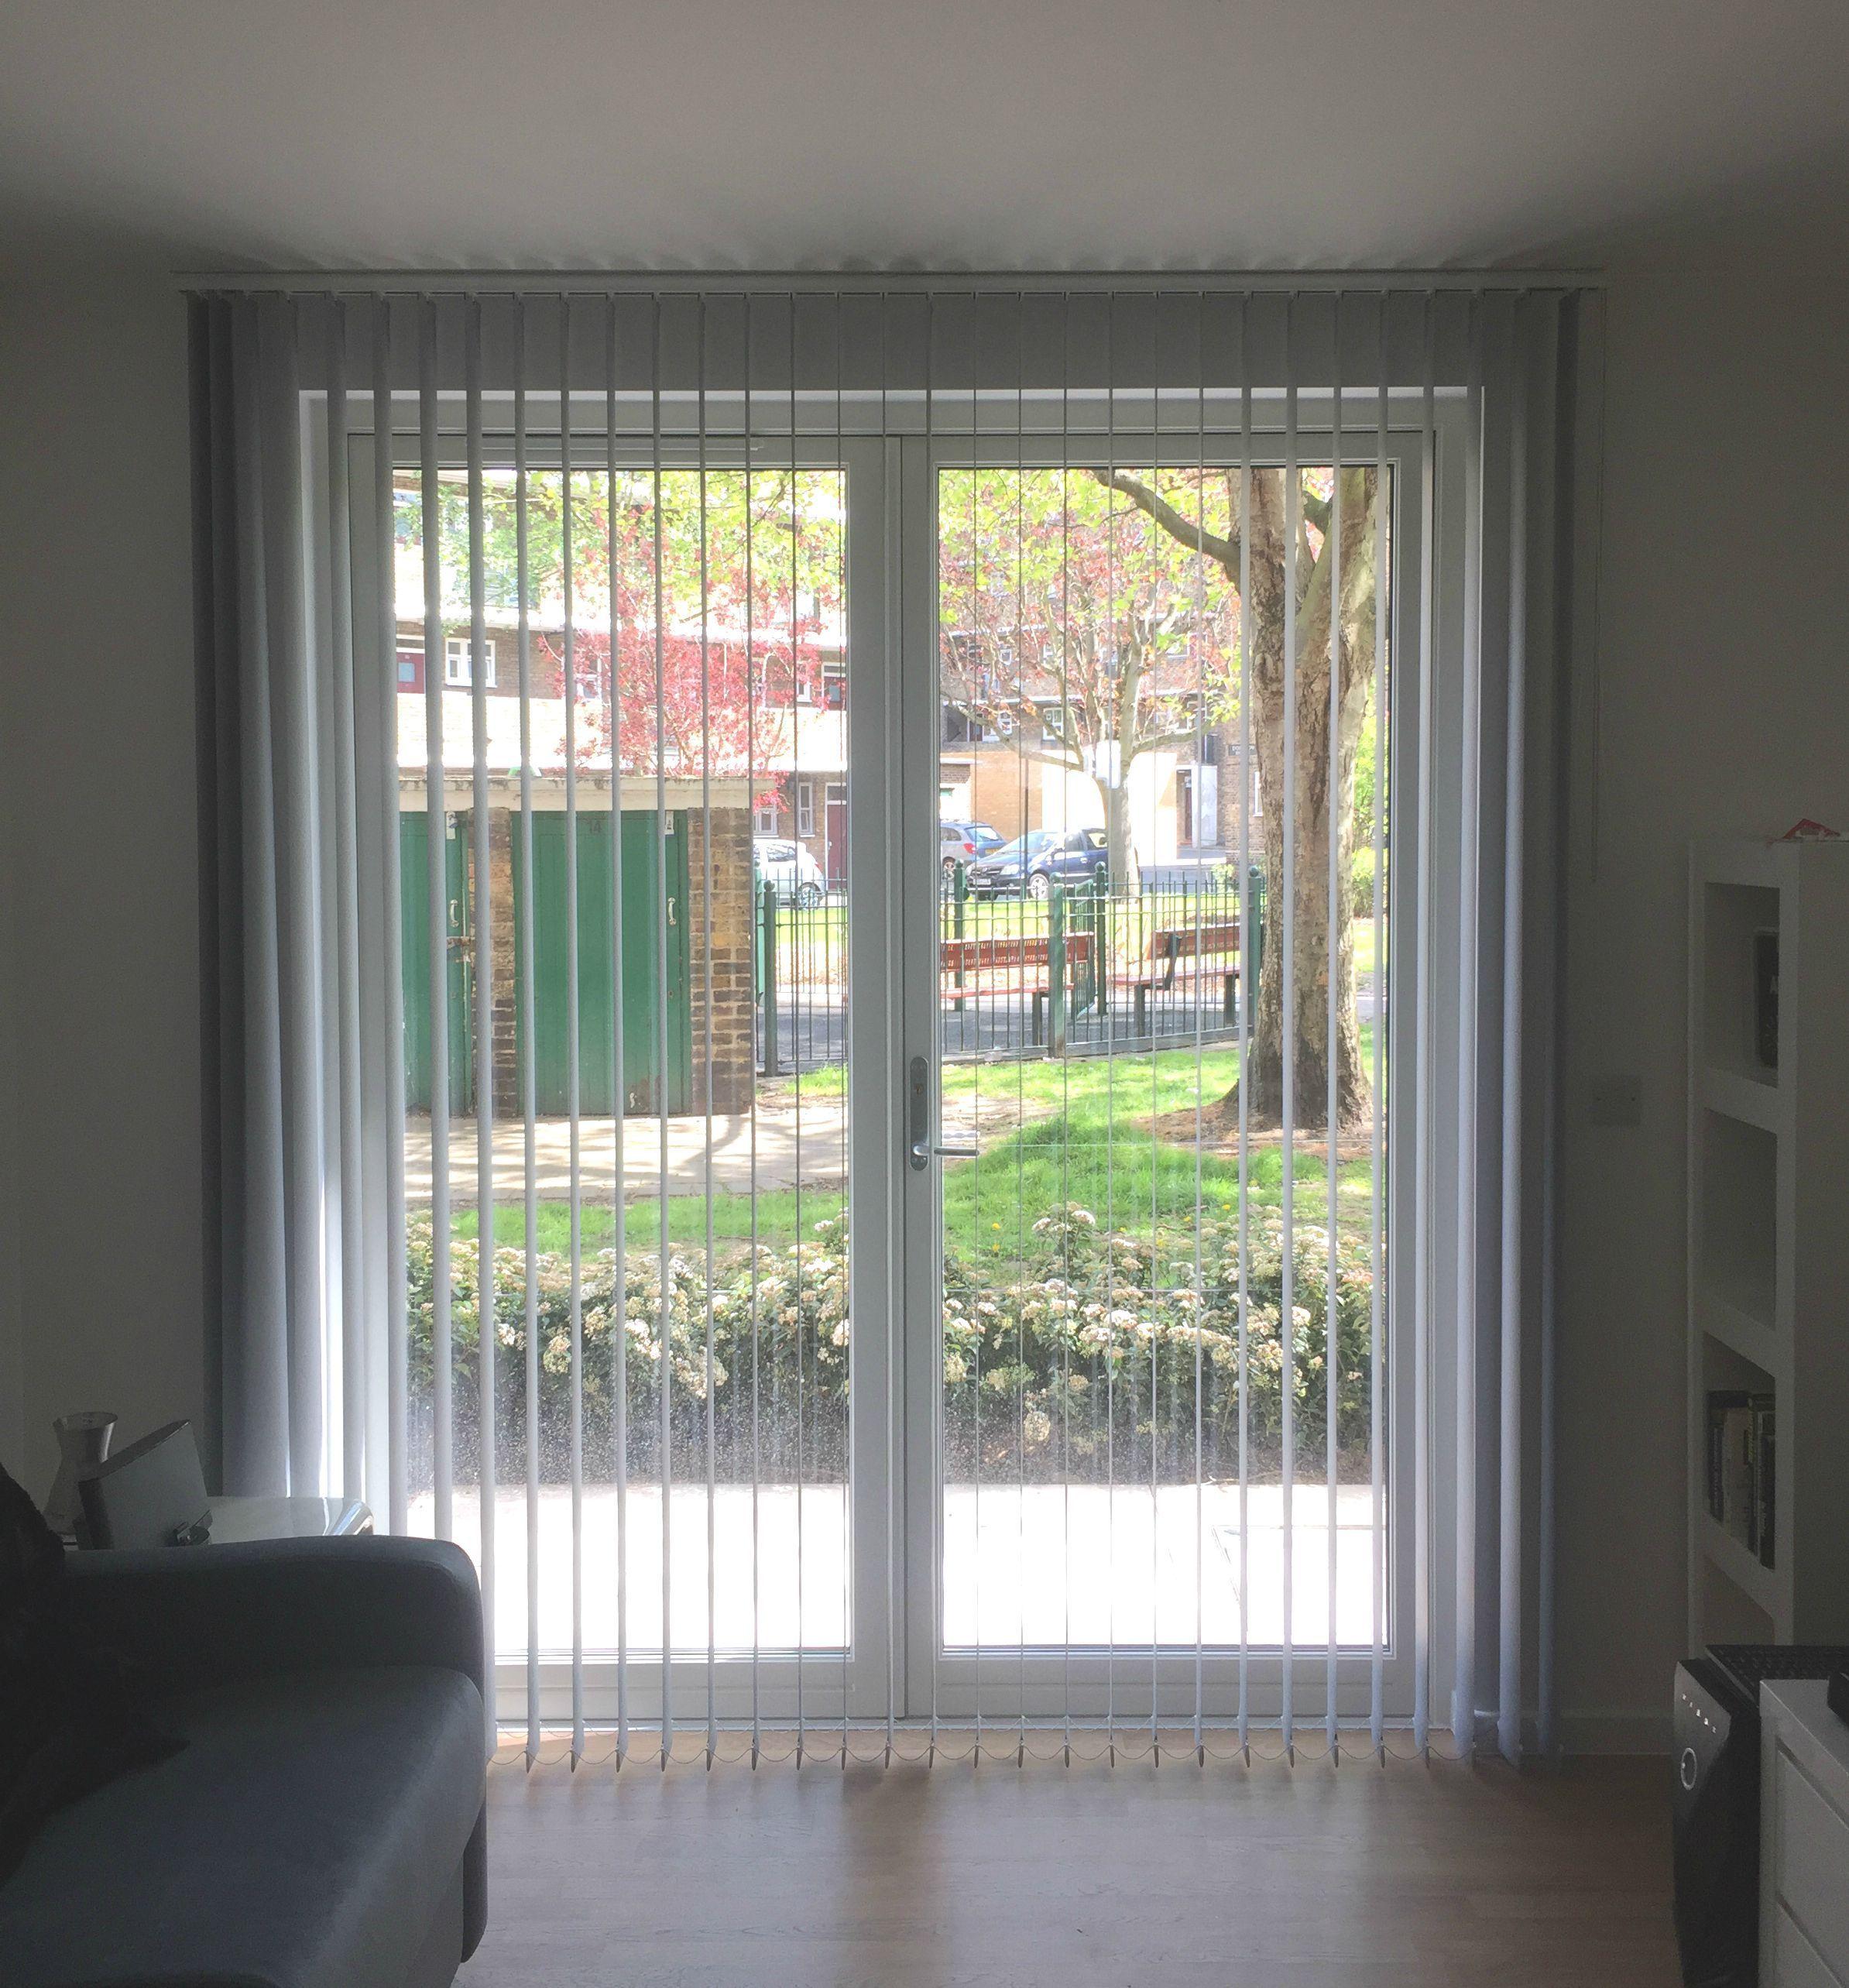 Vertical blinds for sliding door in living room in lambeth london